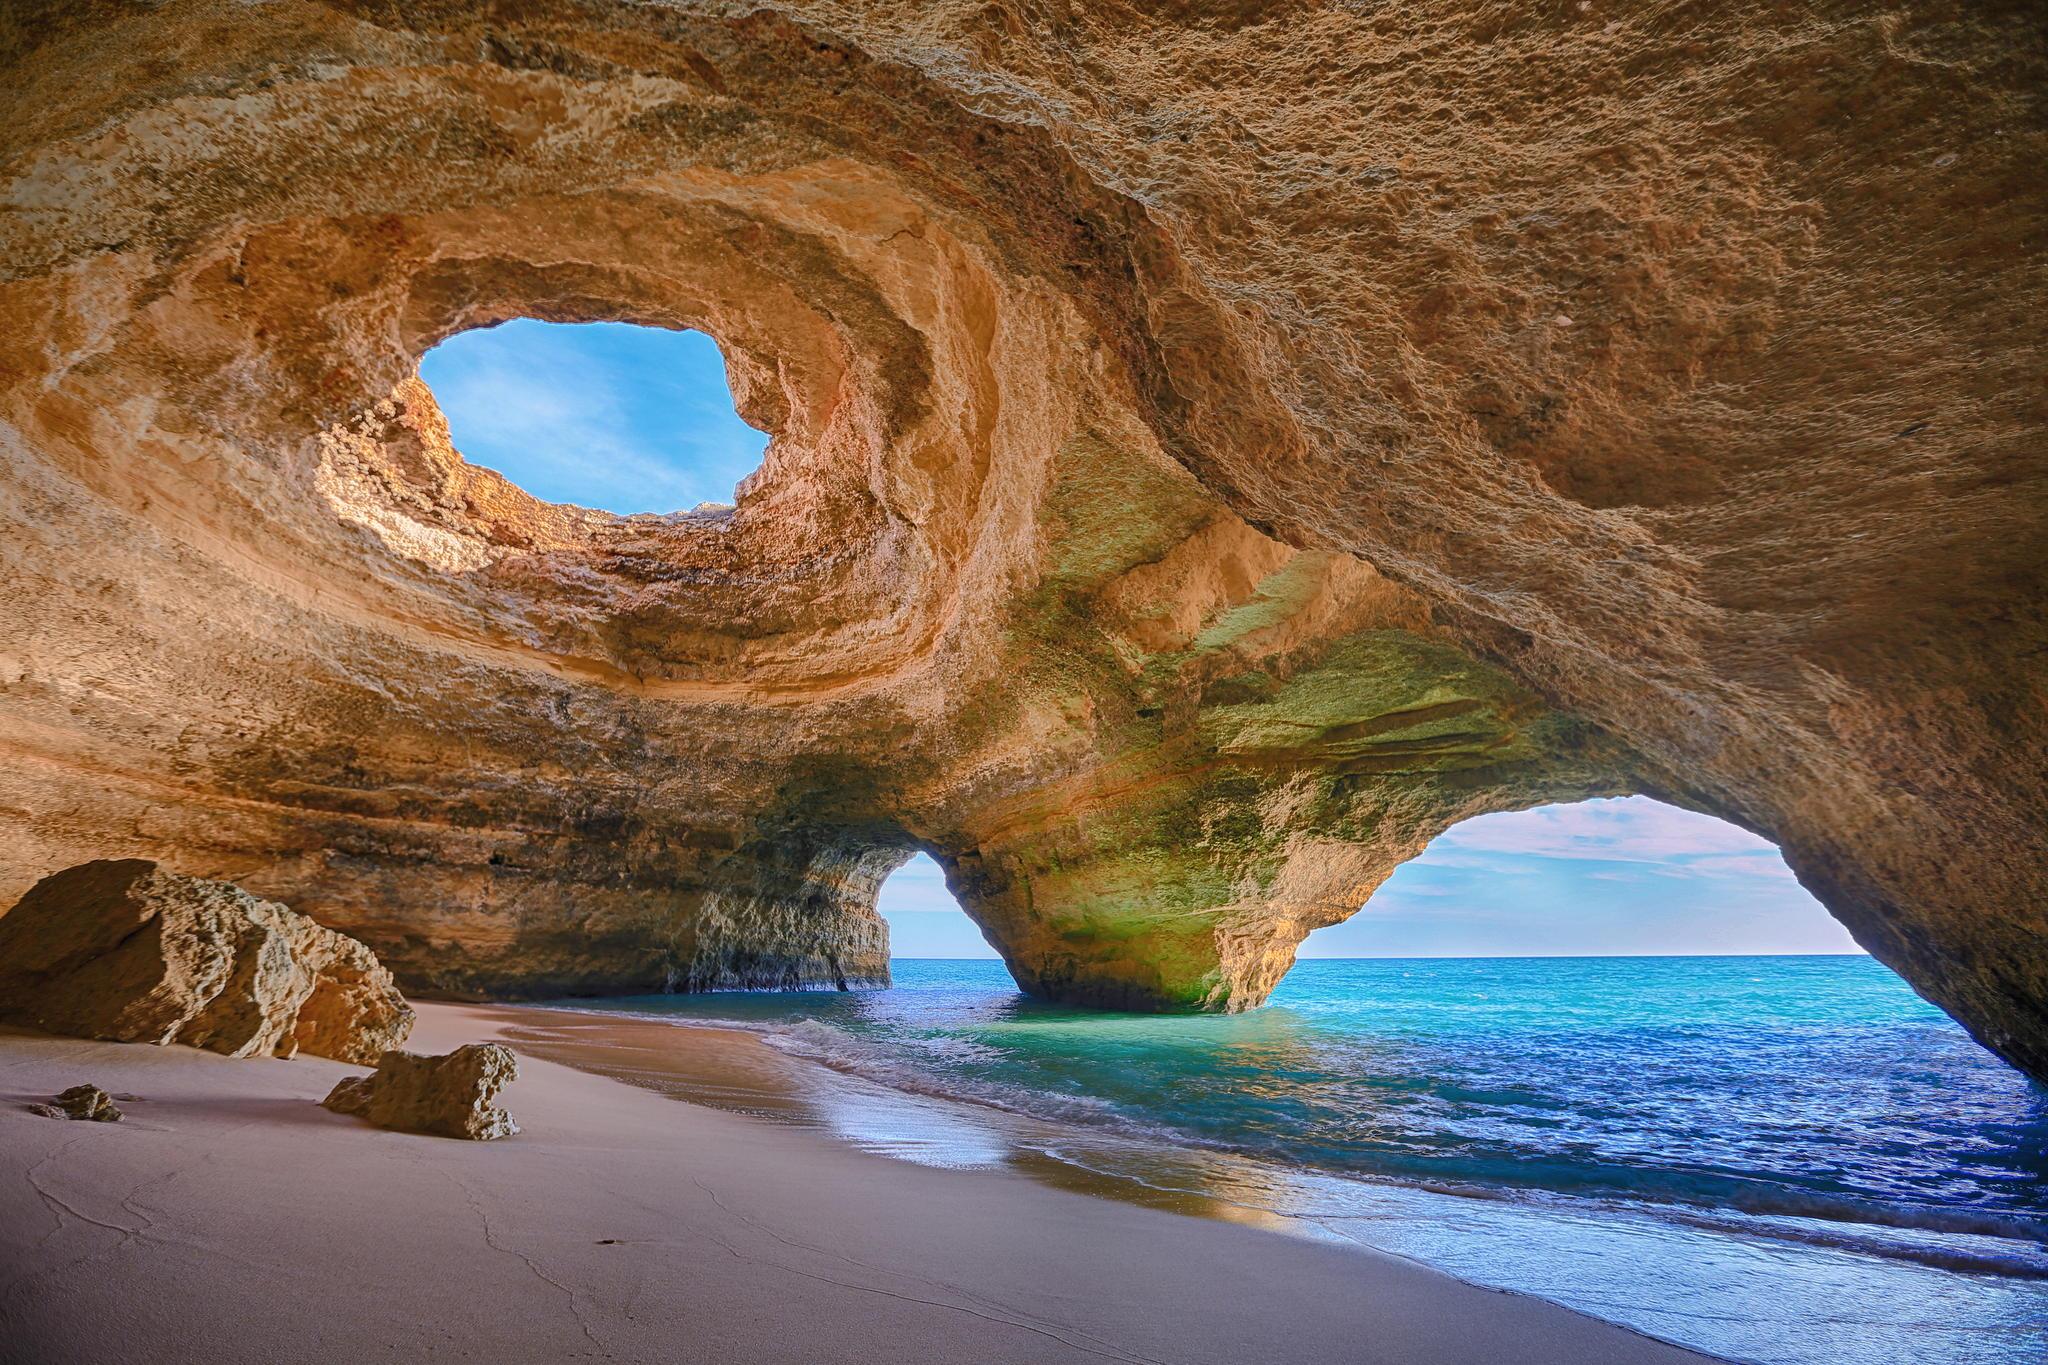 Benagil_Cave_Algarve